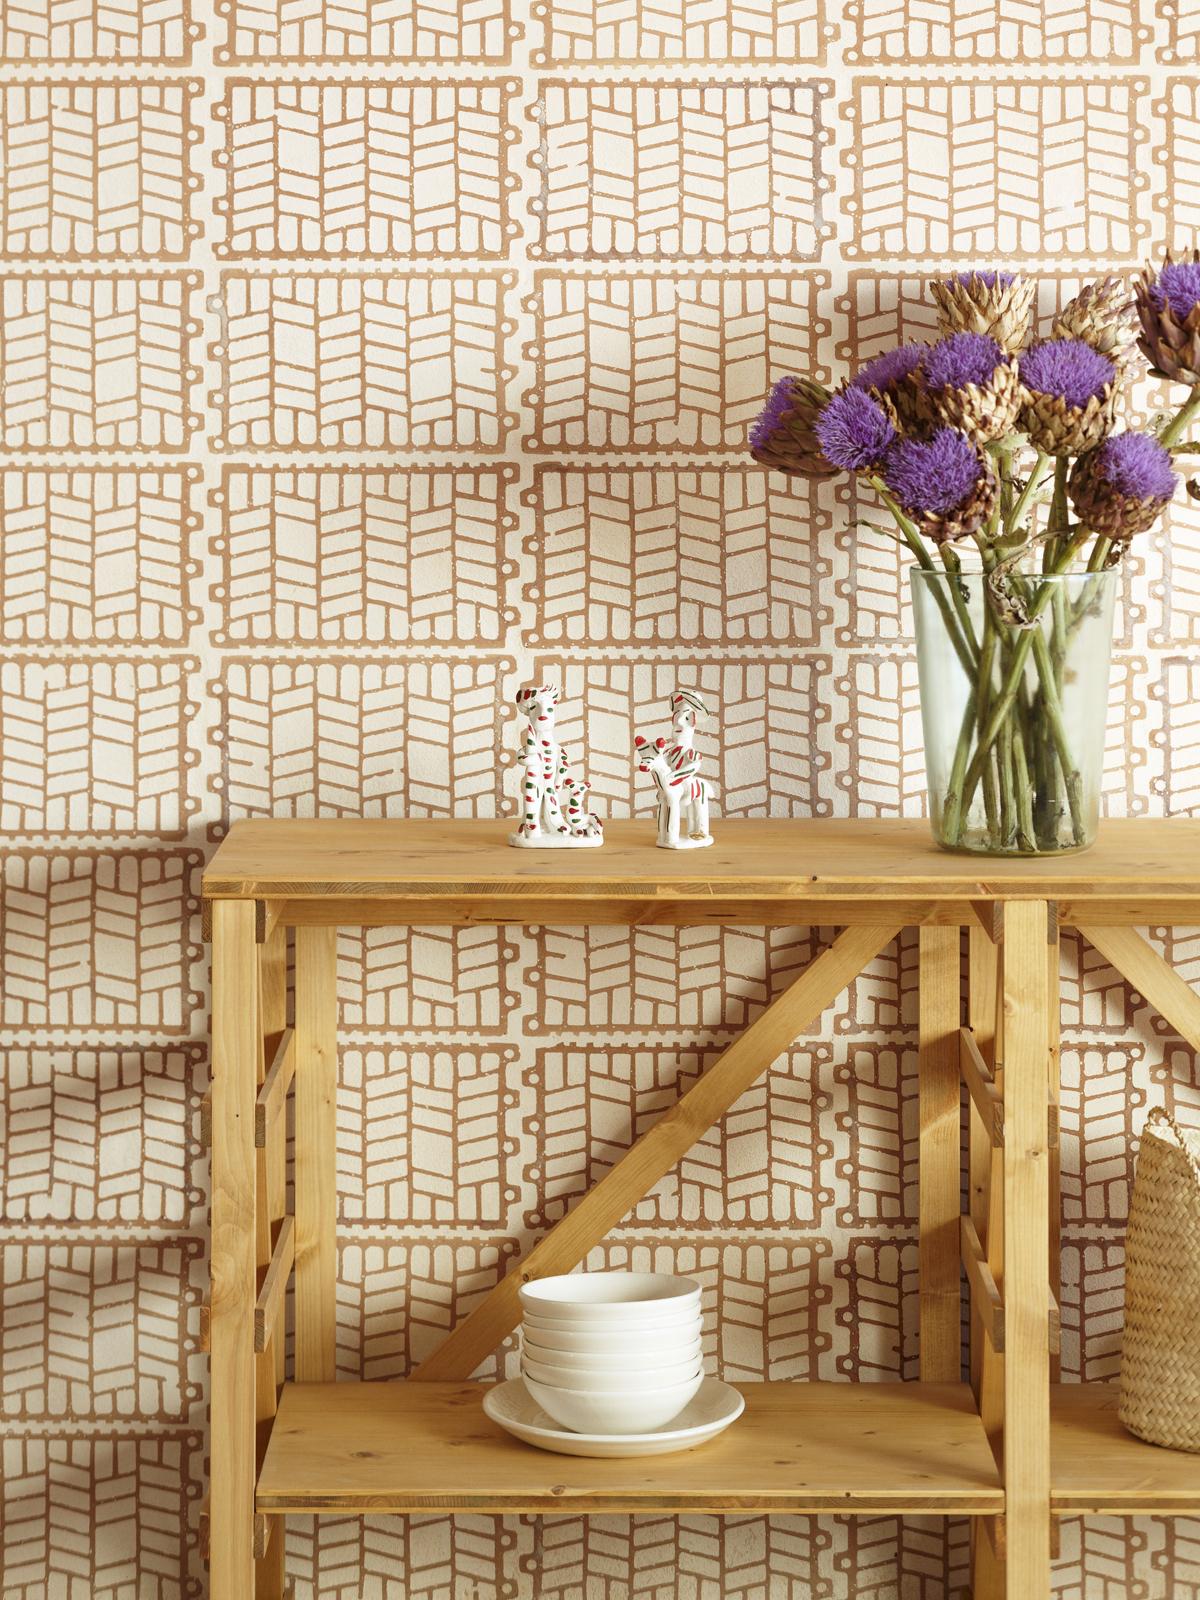 Plaster filled terracotta tiles in the home